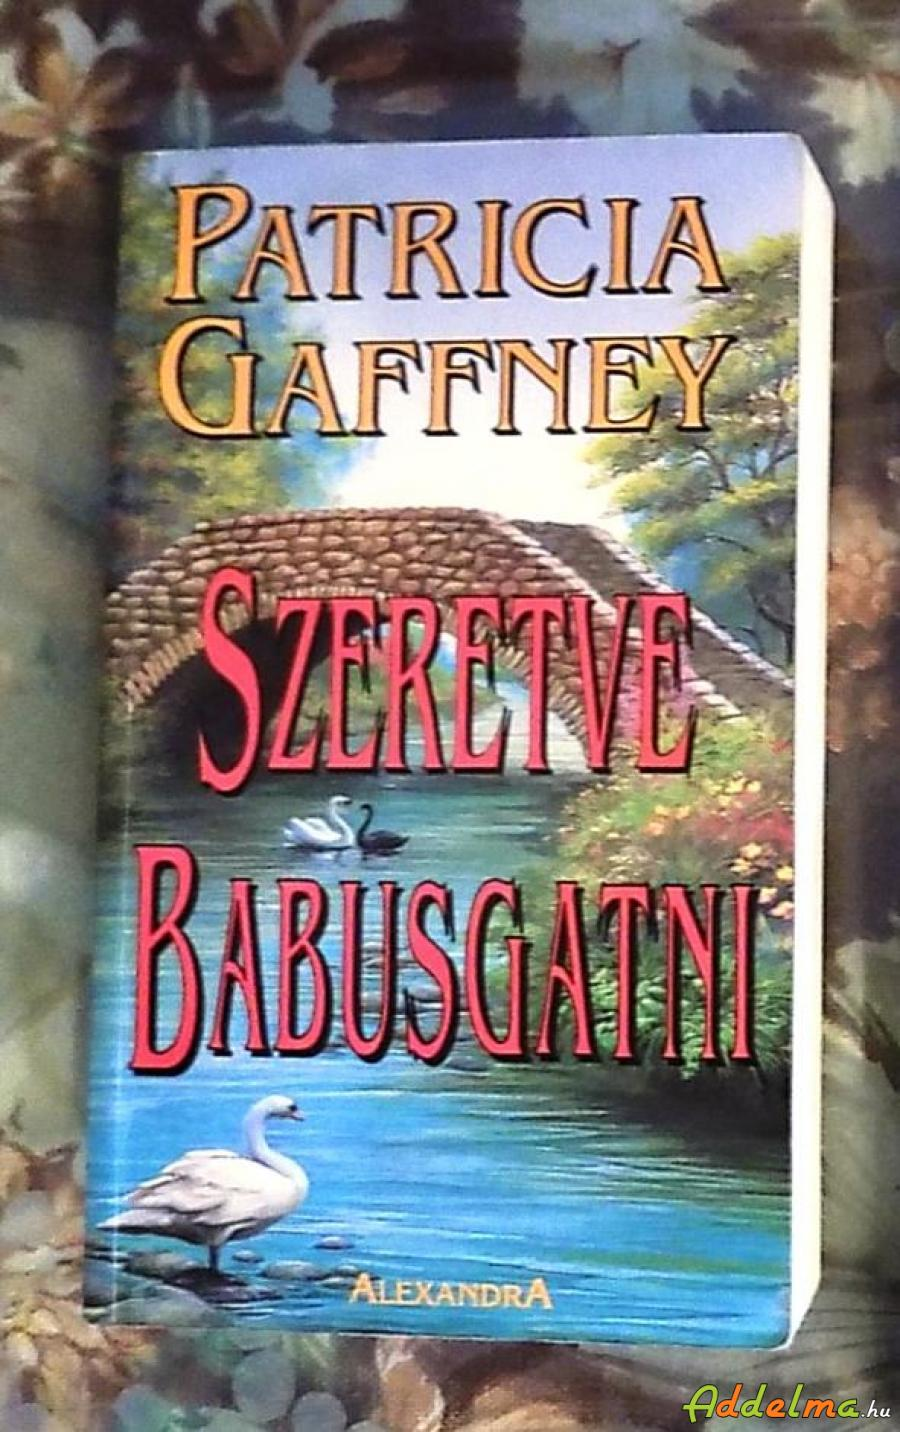 Patricia Gaffney: Szeretve babusgatni